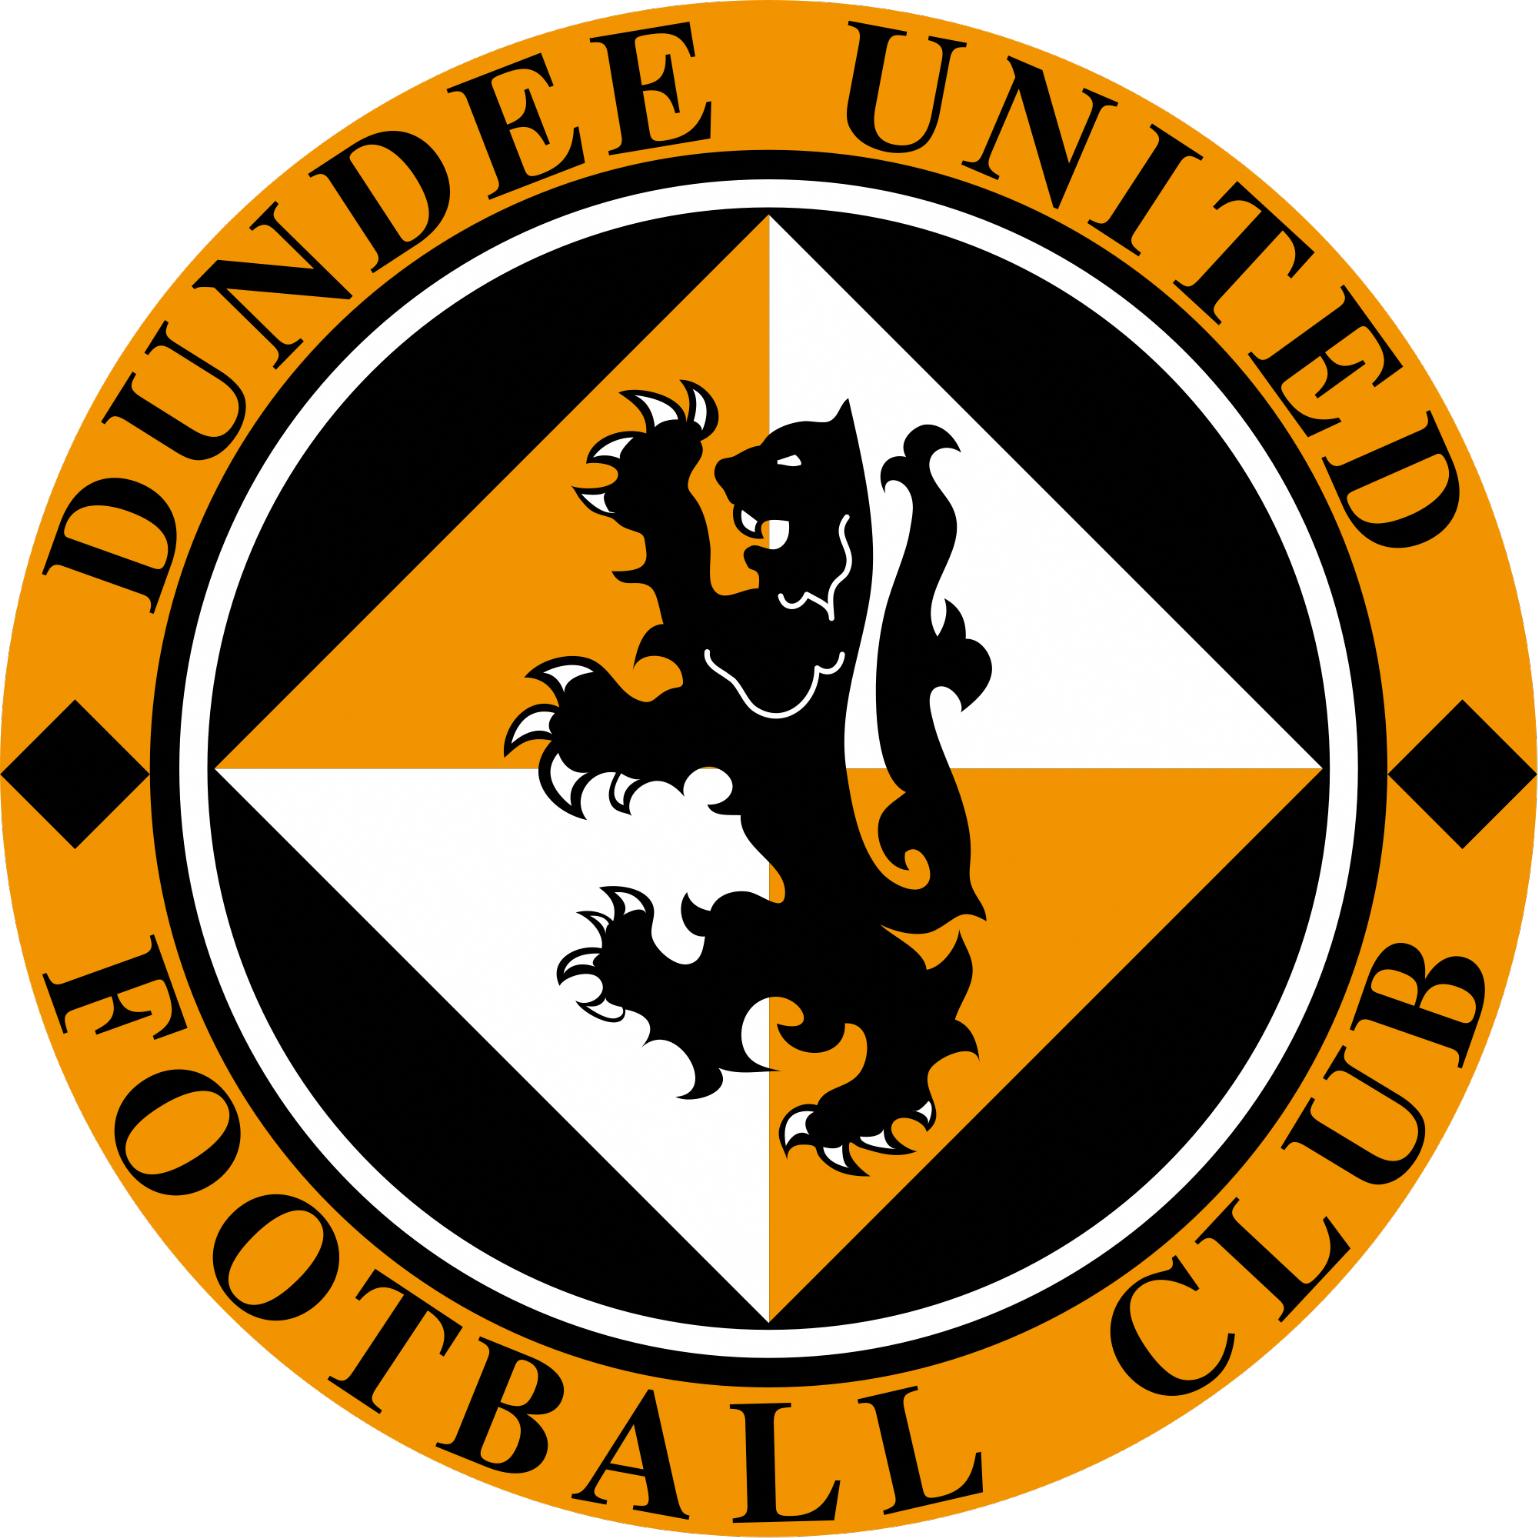 Dundee United FC vinyl sticker shaped contoured 120mm football